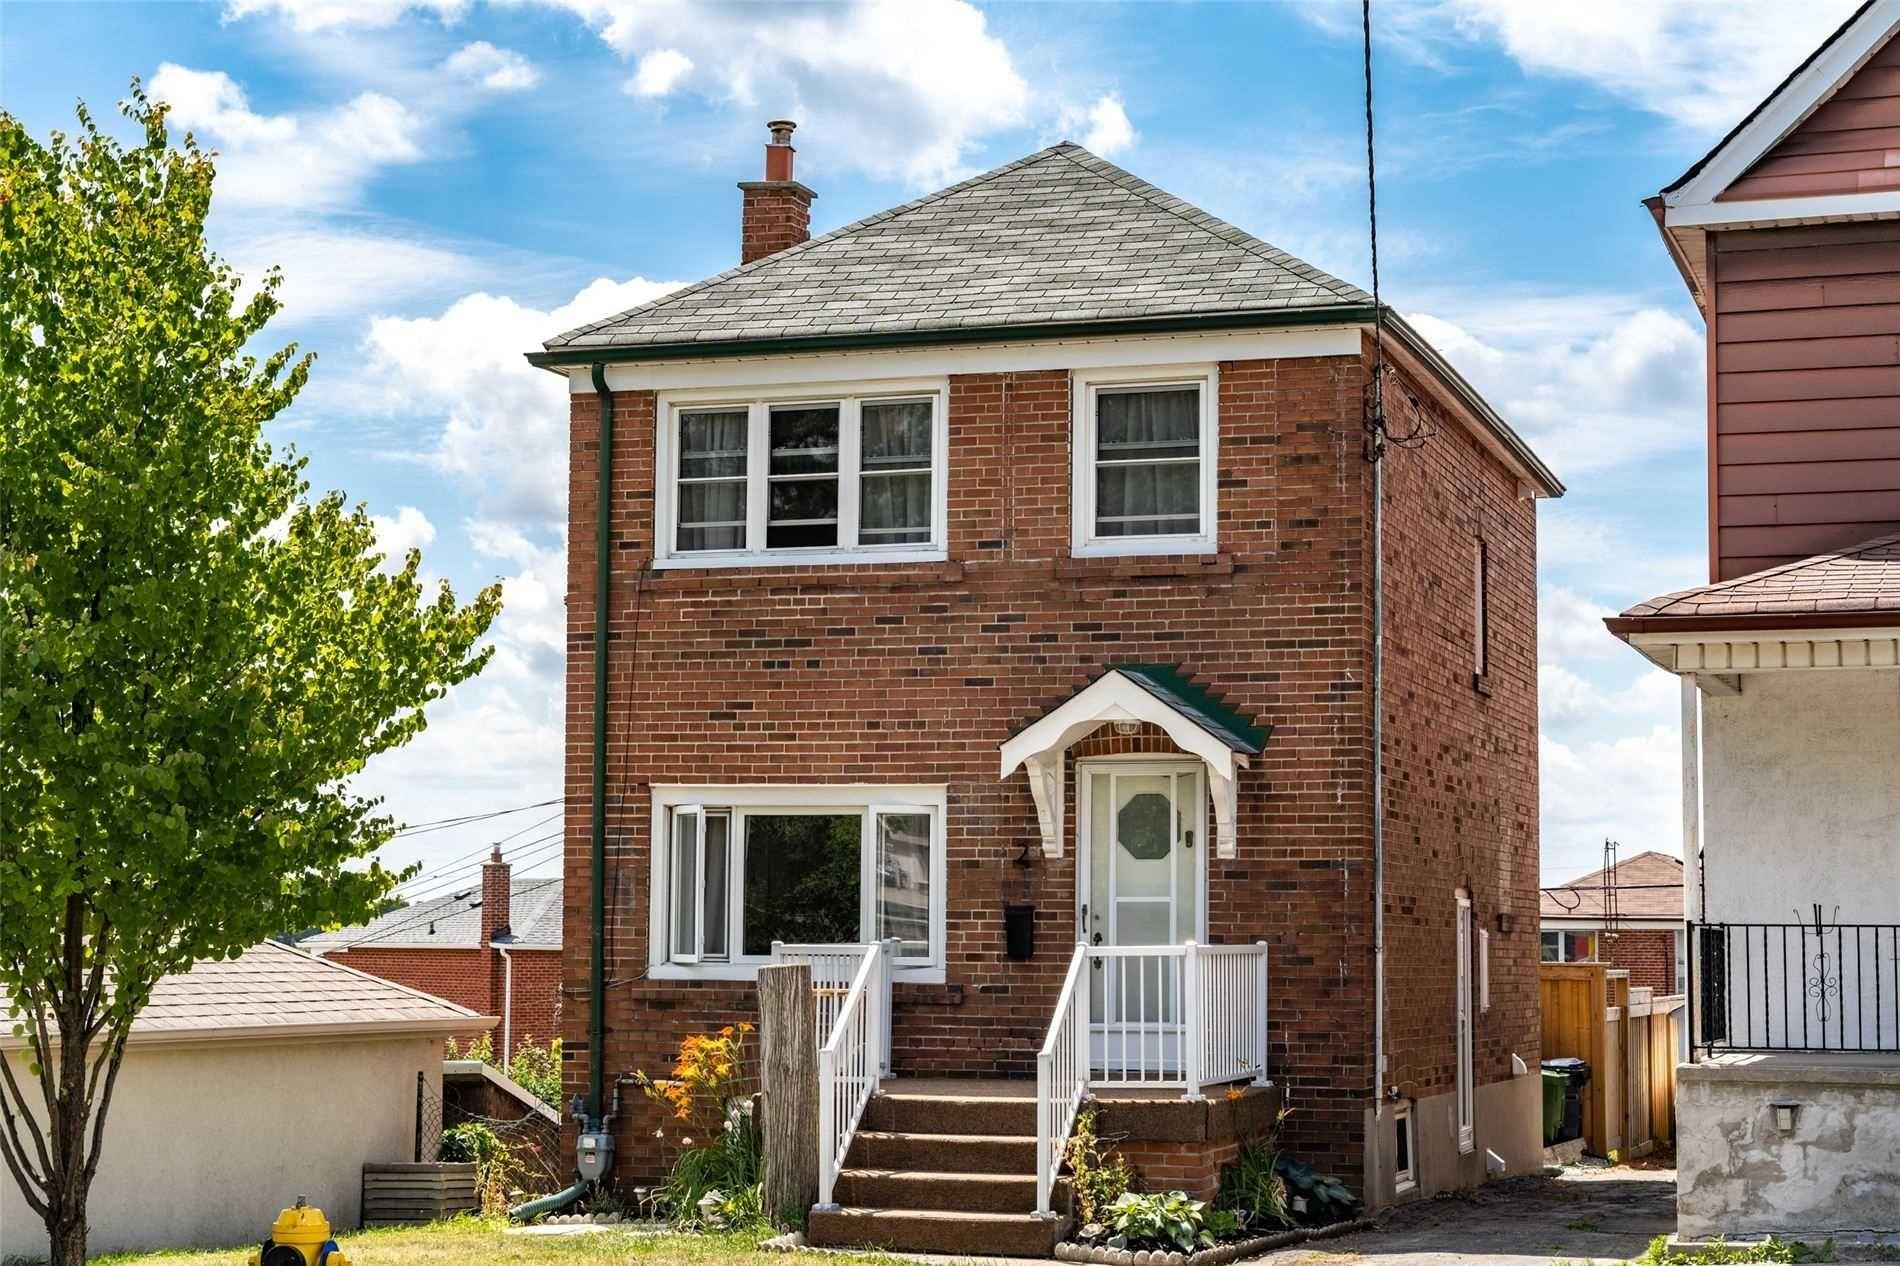 Main Photo: 2 Kirknewton Road in Toronto: Caledonia-Fairbank House (2-Storey) for sale (Toronto W03)  : MLS®# W4832621